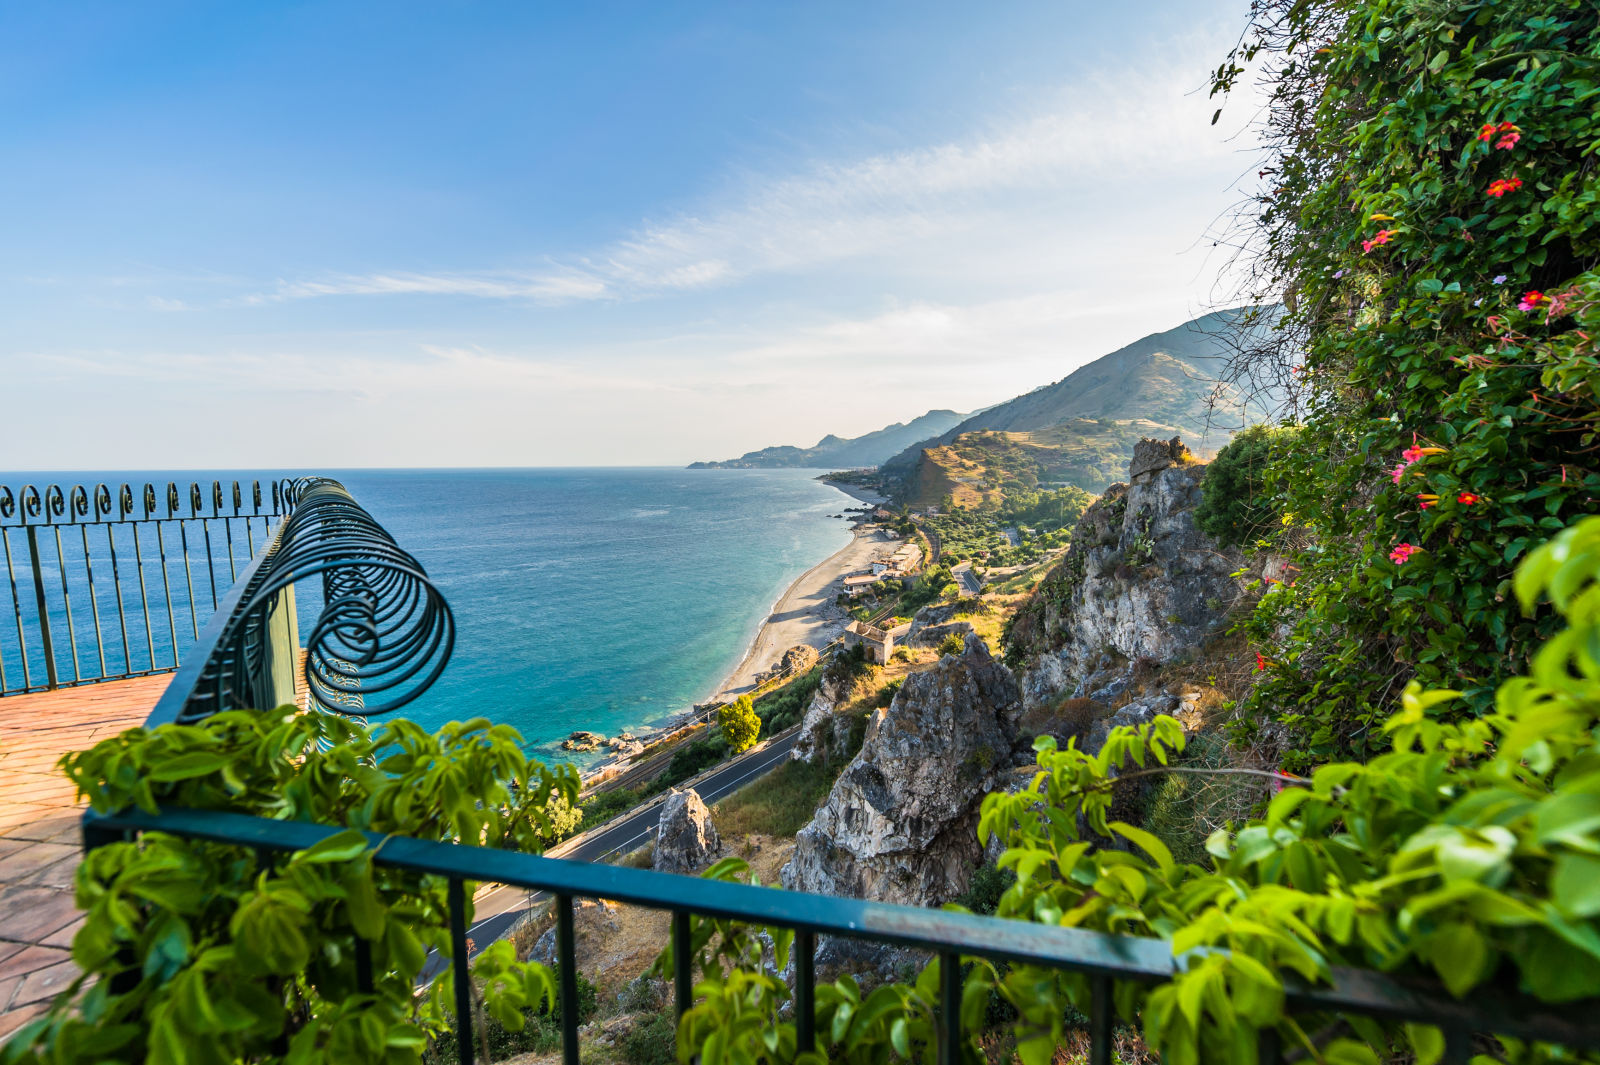 Europe, Italy, Sicily